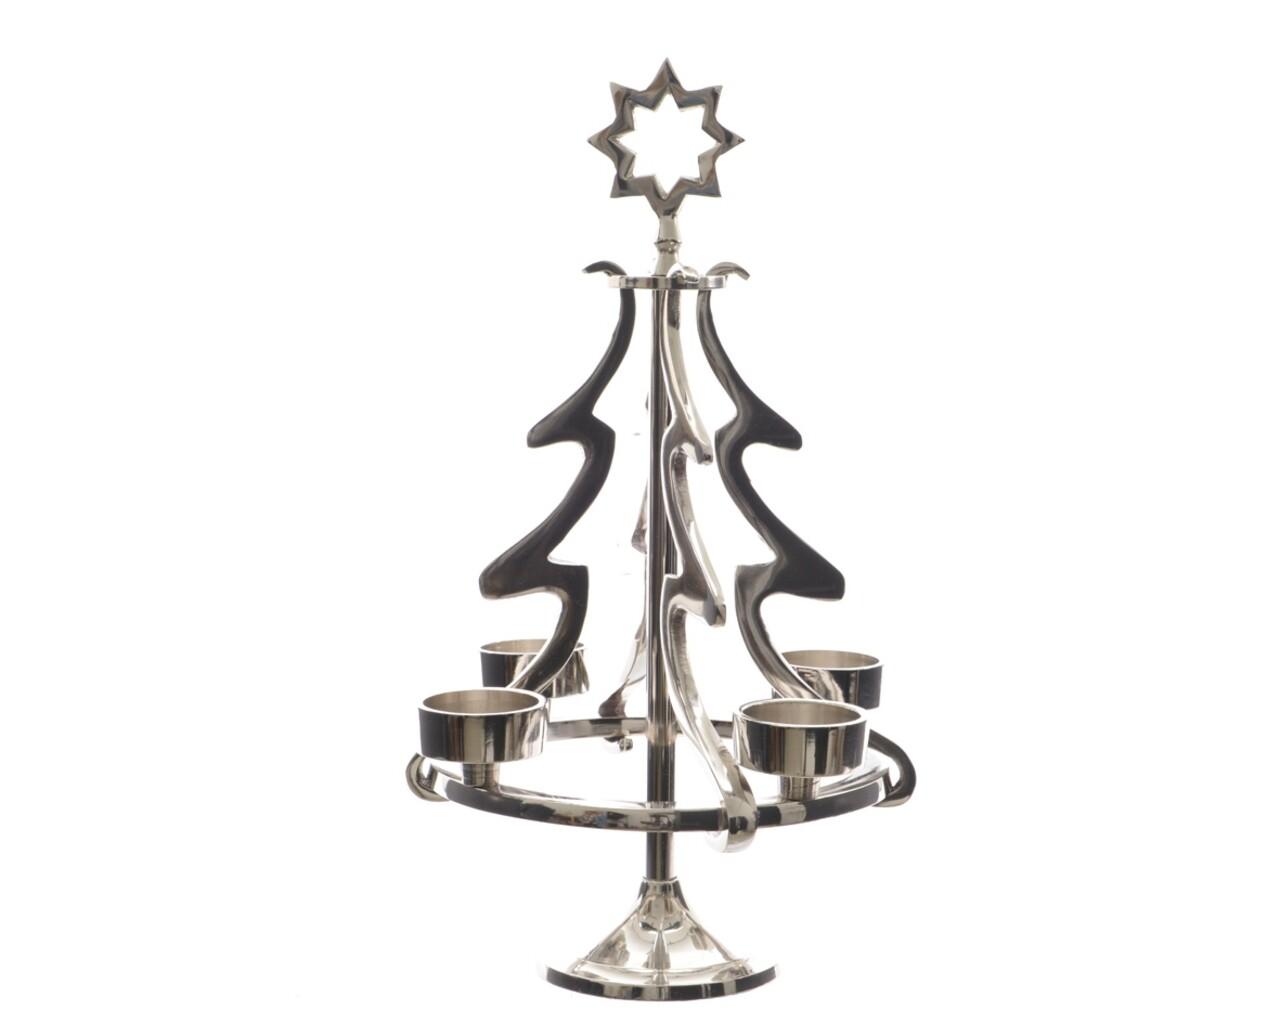 Suport pentru lumanari Tree, Decoris, 22 x 36 cm, aluminiu, argintiu